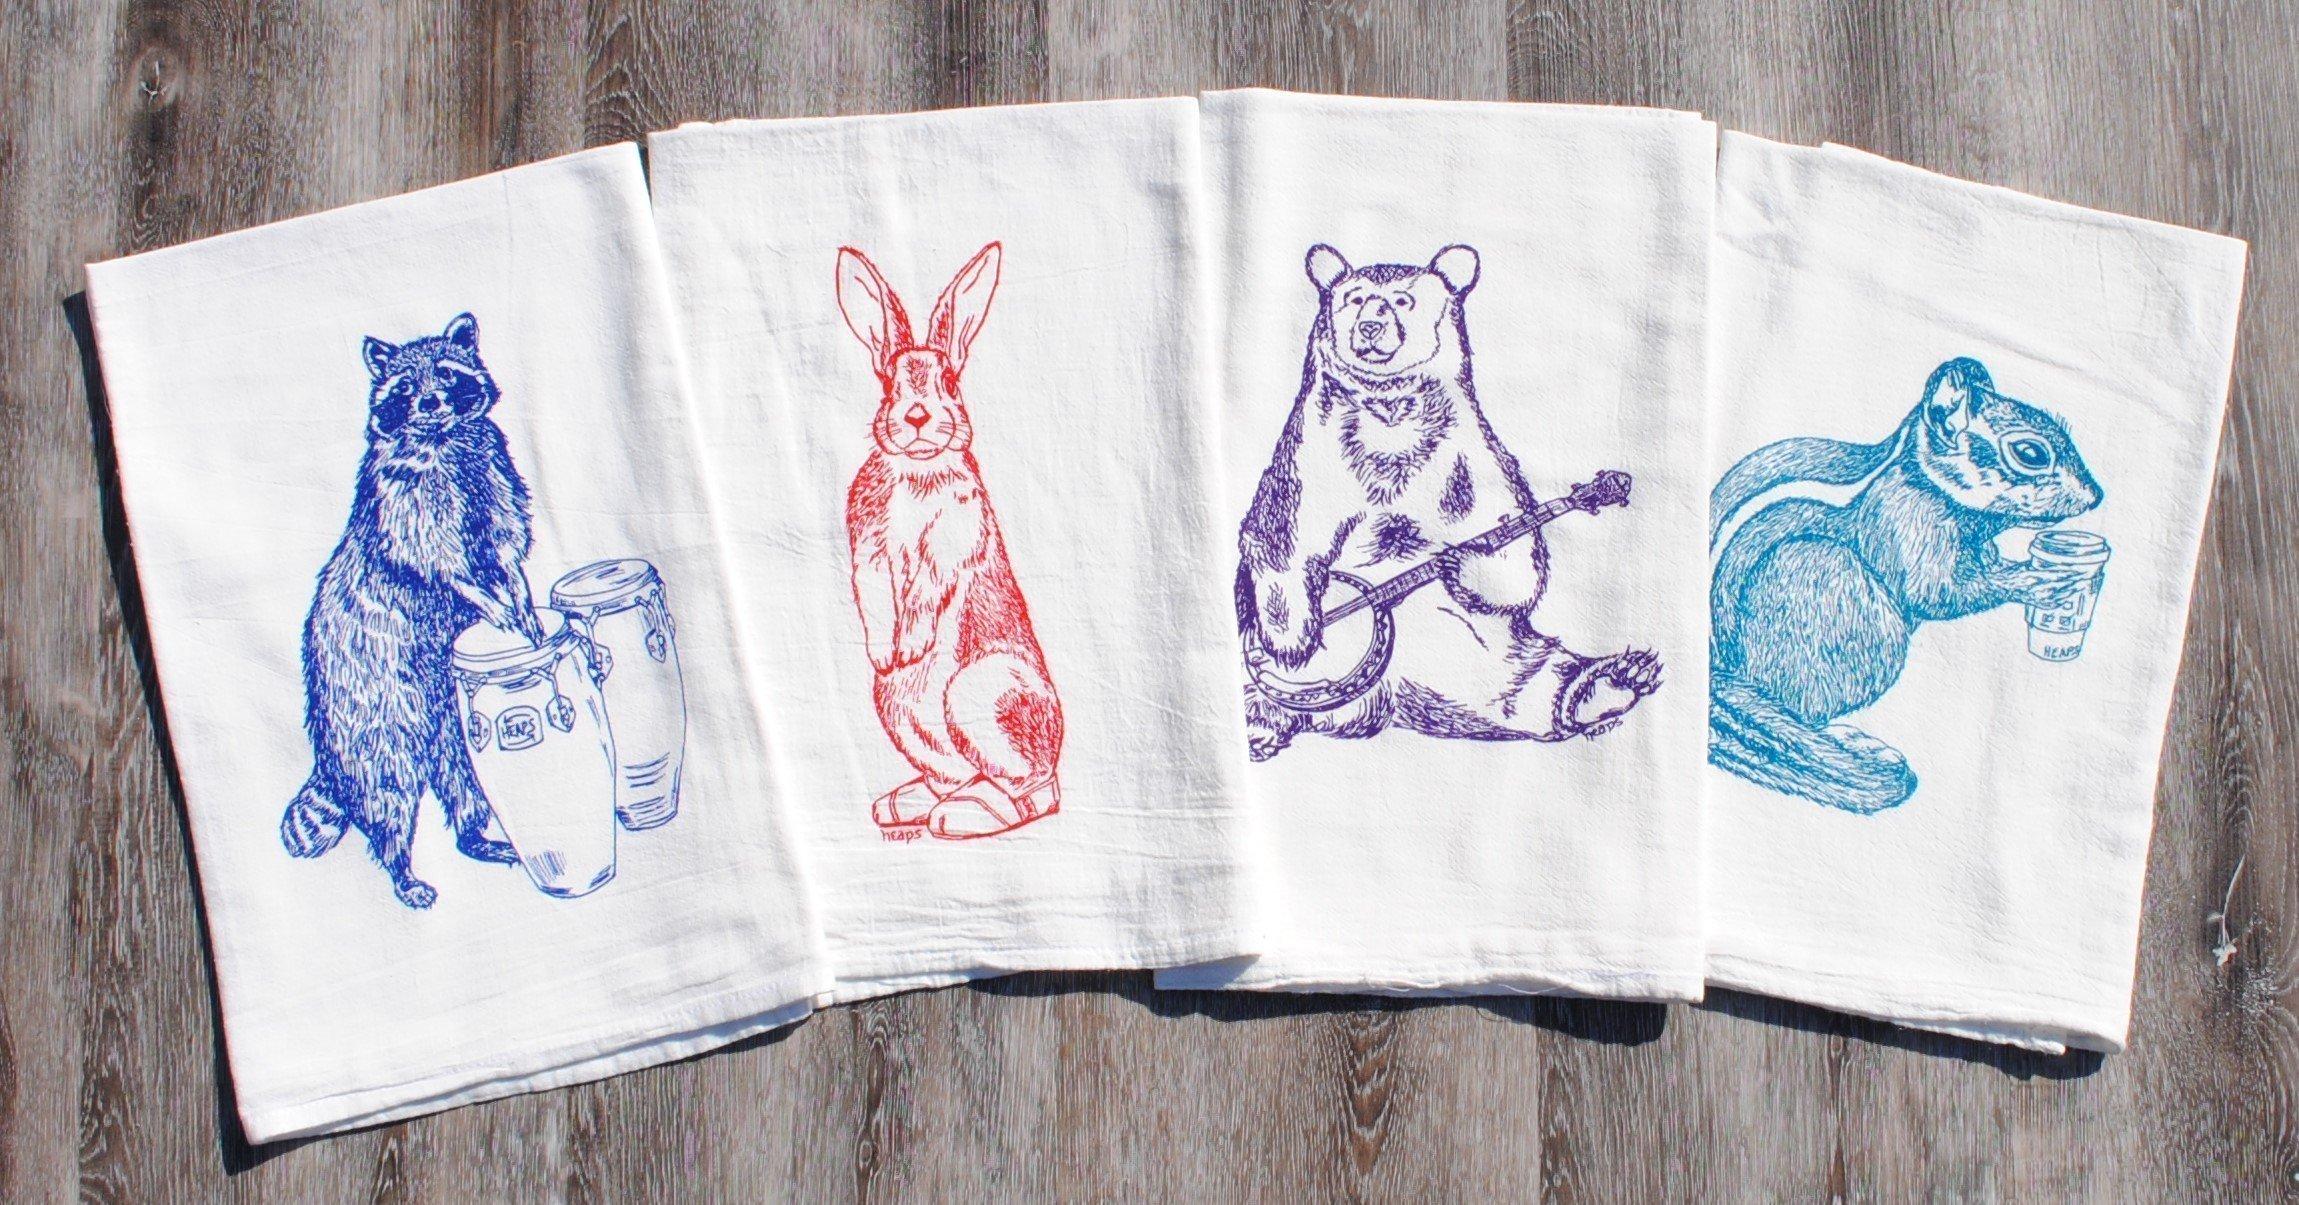 Kitchen Tea Towel Set of 4 - 100% Cotton Flour Sack - 26'' x 25'' - Forest Animals